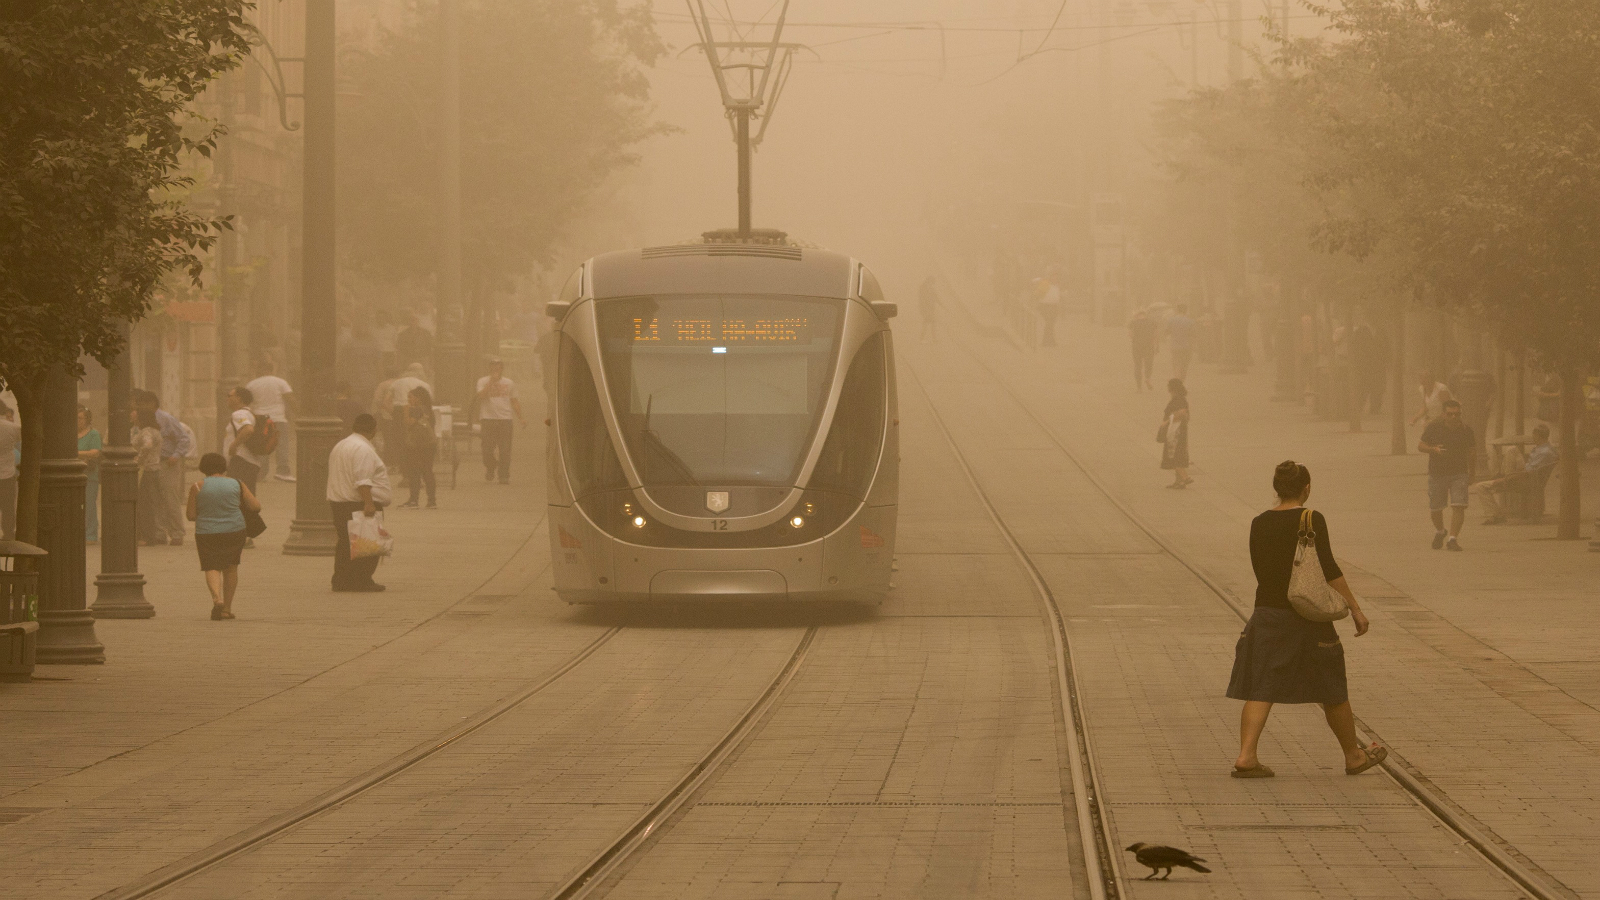 Israelis walk across the light-rail tracks on Jaffa Road in Jerusalem on September 8, 2015, as a sandstorm hit Israel. Photo by Yonatan Sindel/FLASH90